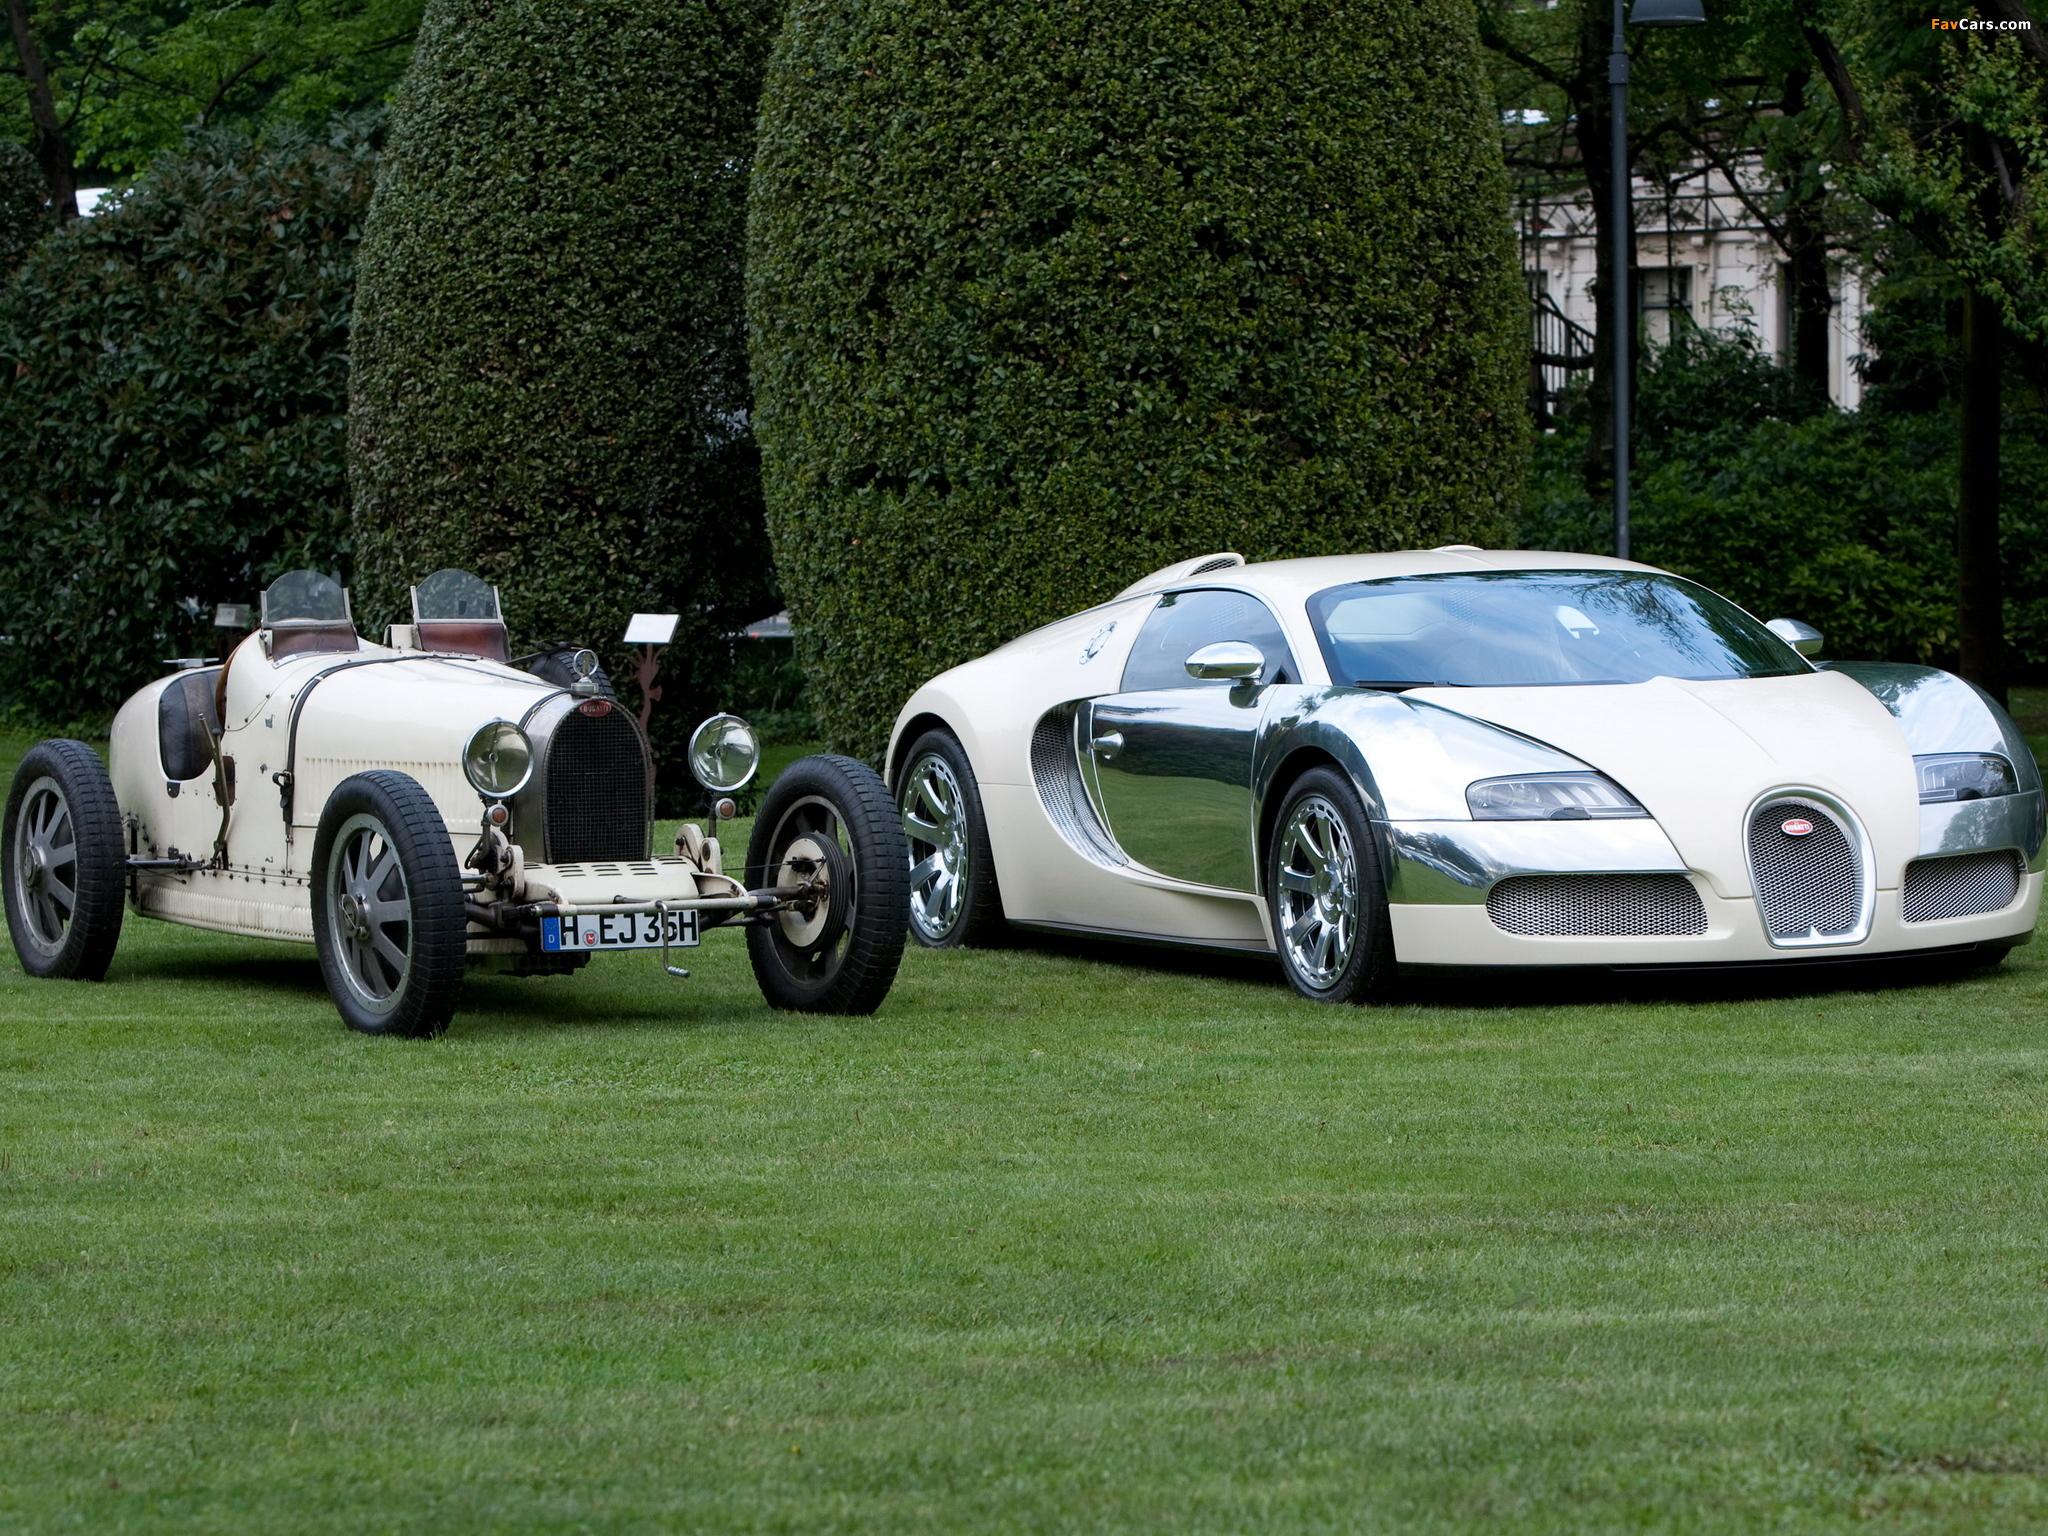 Bugatti wallpapers (2048 x 1536)